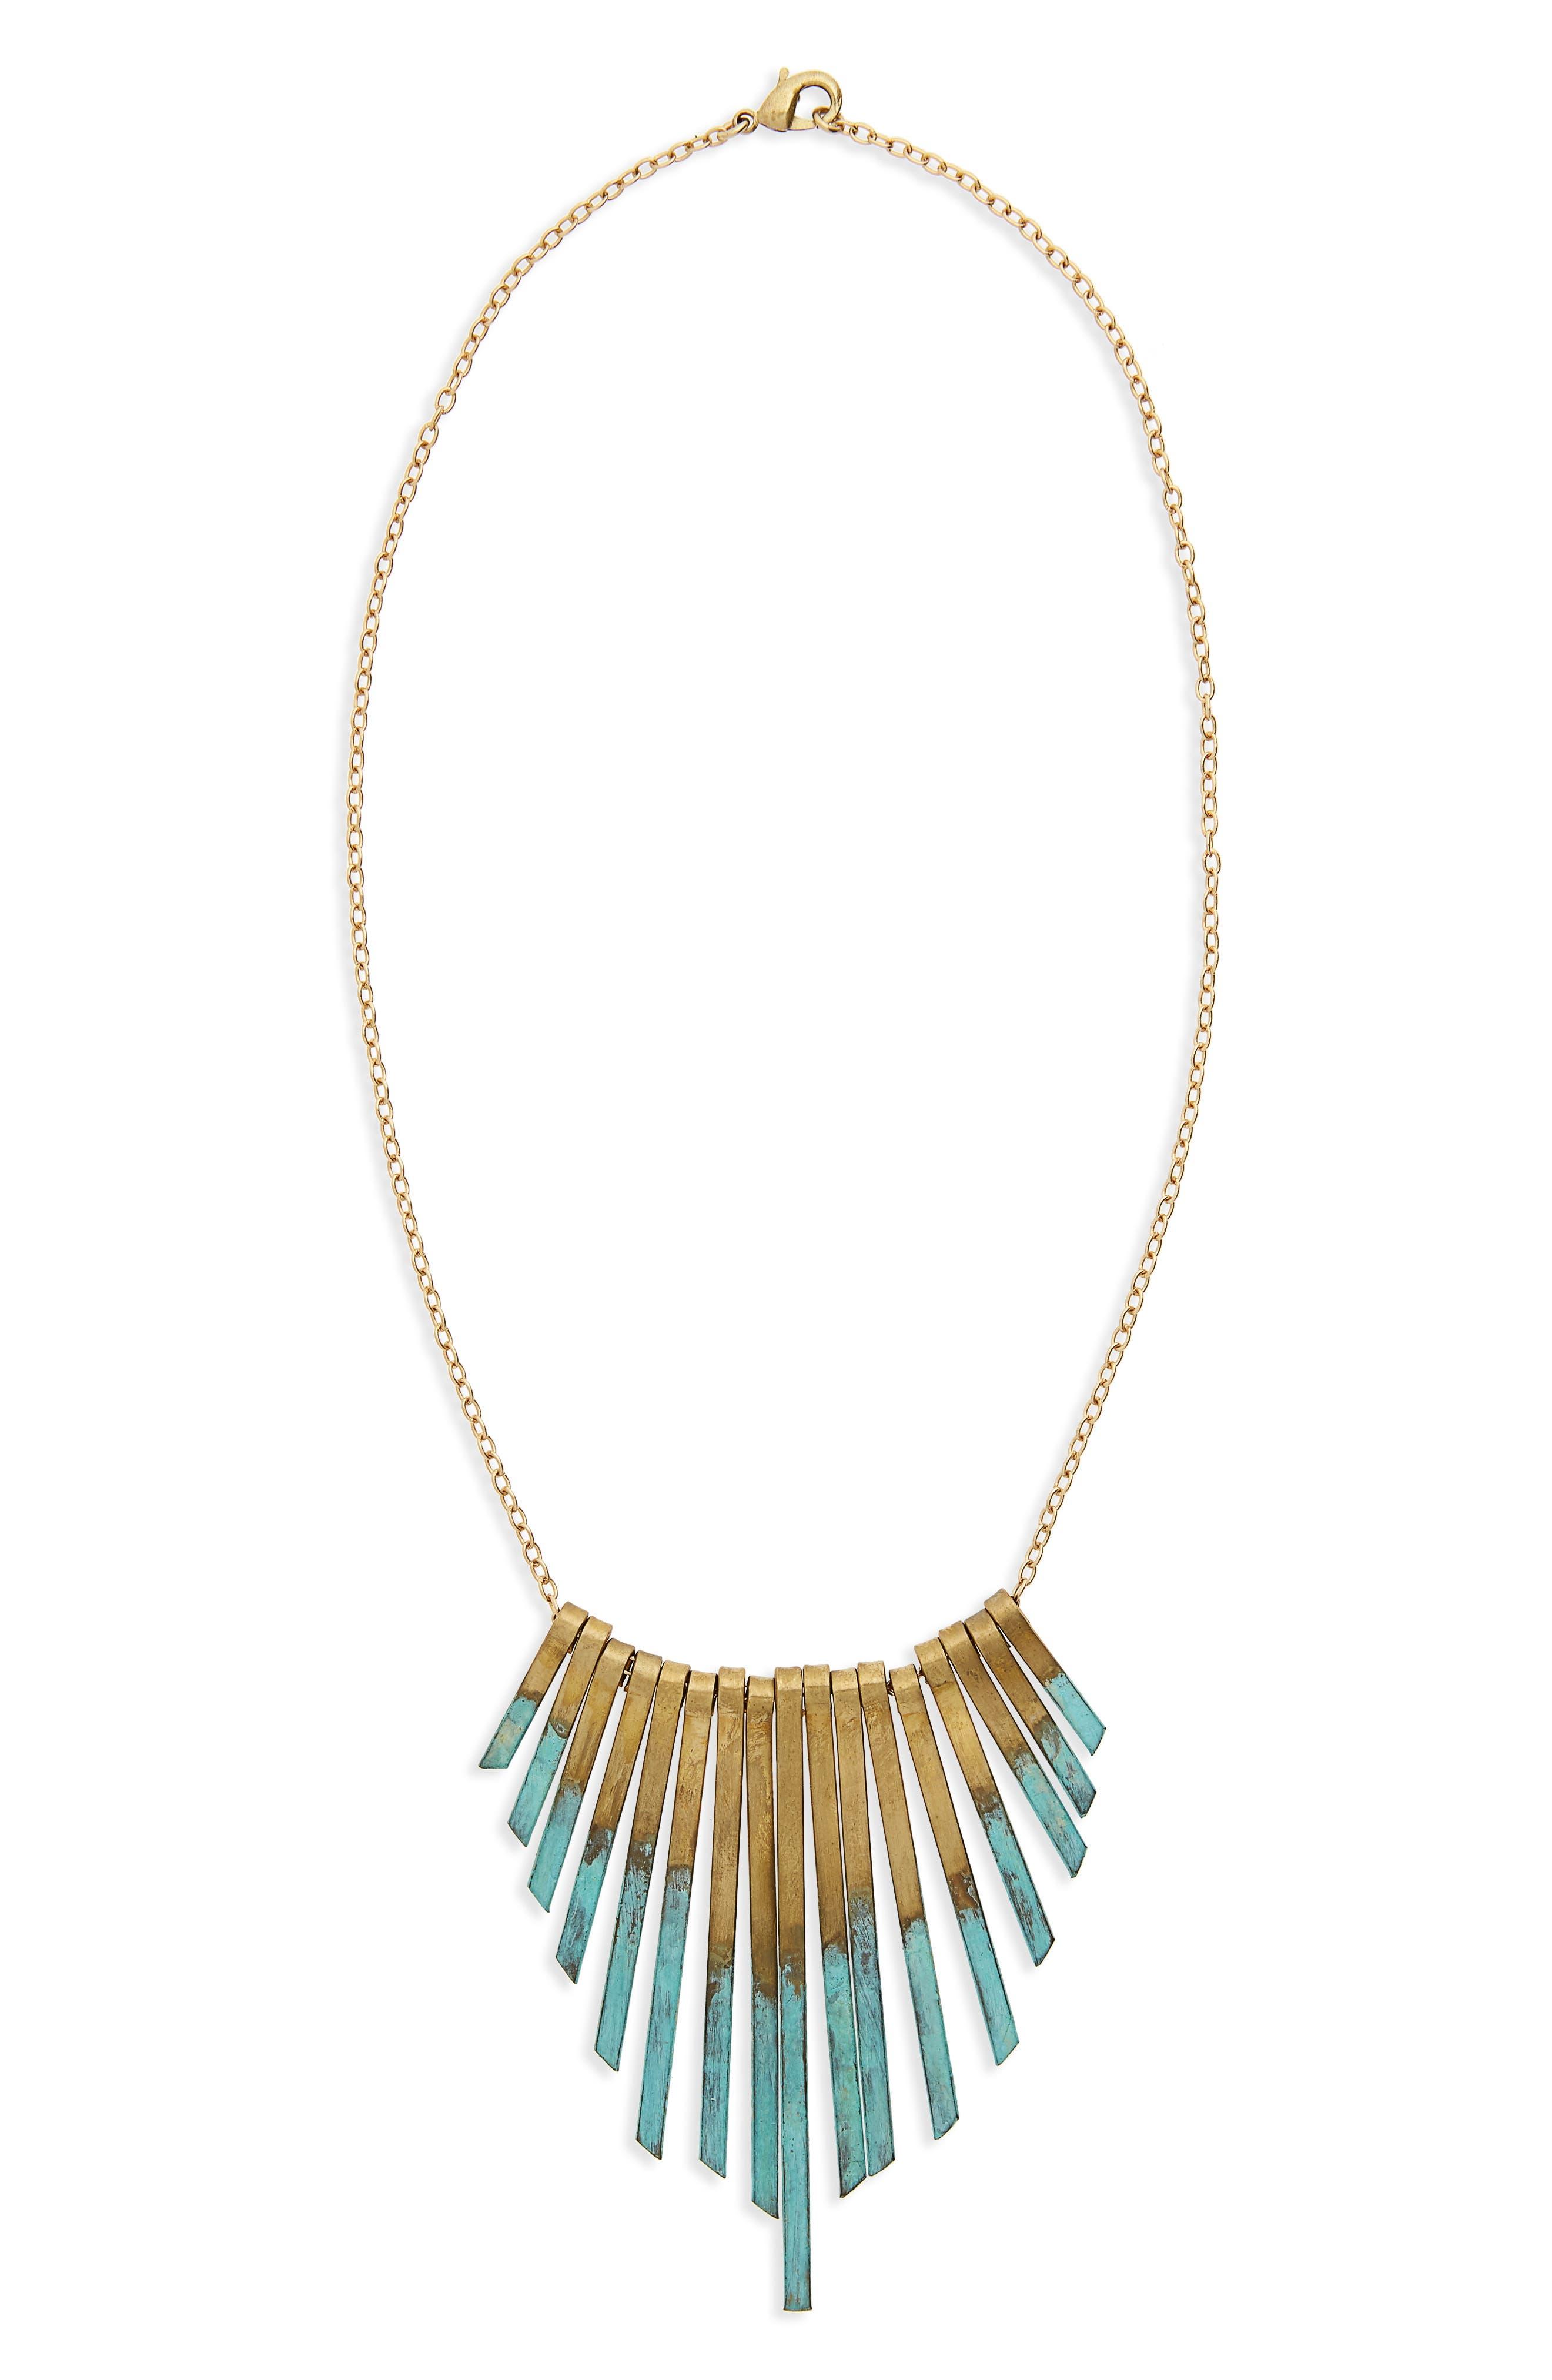 Patina Stick Necklace,                         Main,                         color, Gold/ Multi